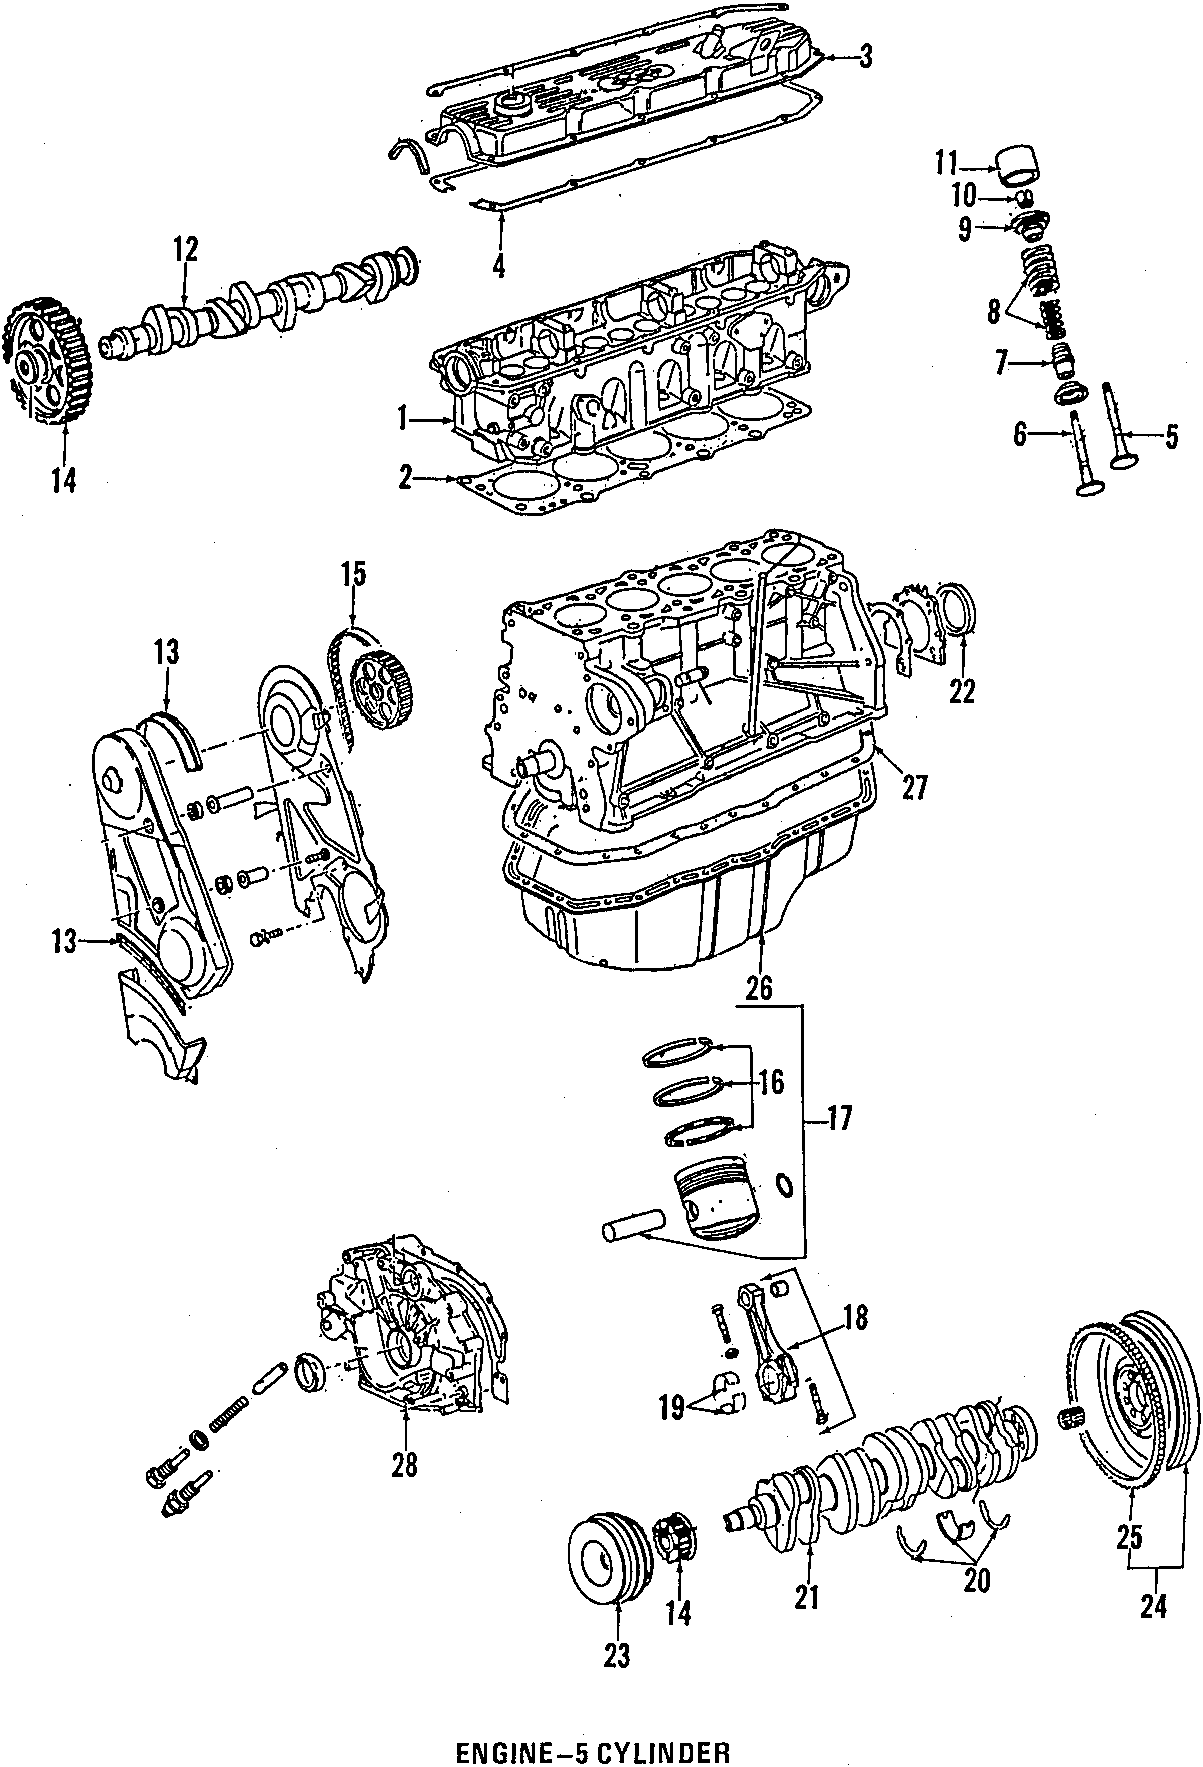 1984 Volkswagen Quantum Engine Oil Pan Gasket. Trans